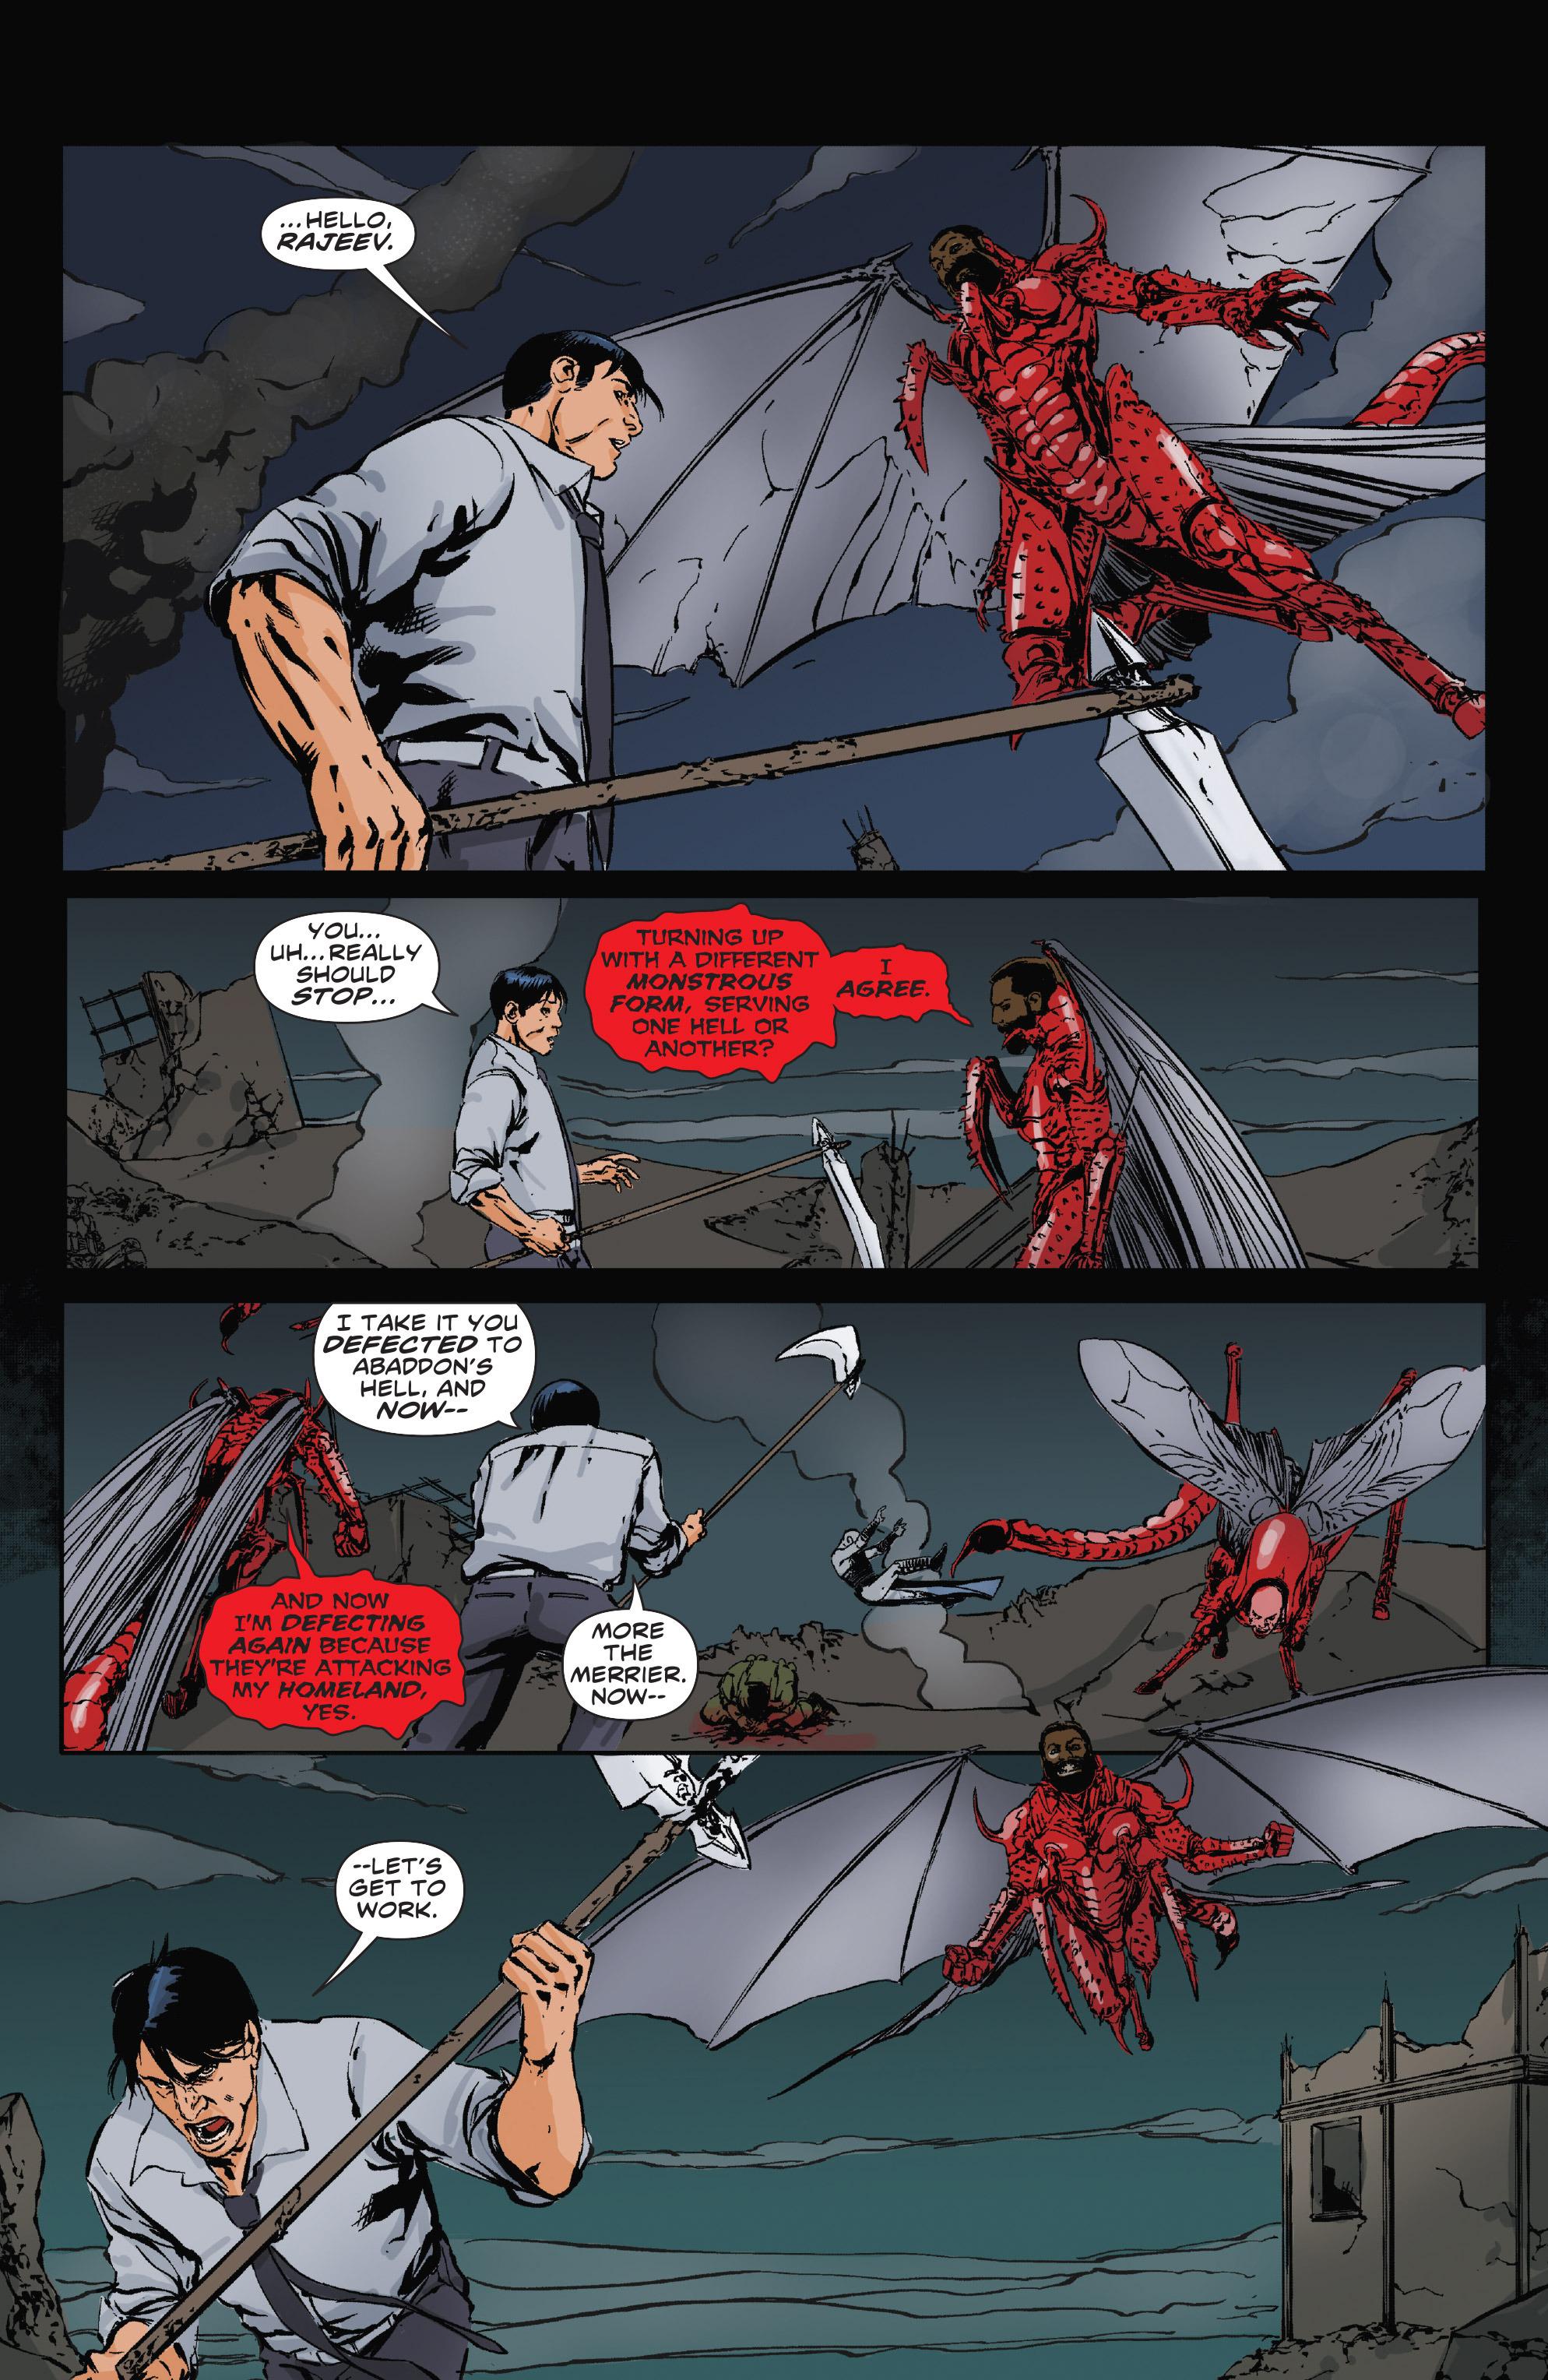 Read online Clive Barker's Hellraiser: The Dark Watch comic -  Issue # TPB 3 - 90